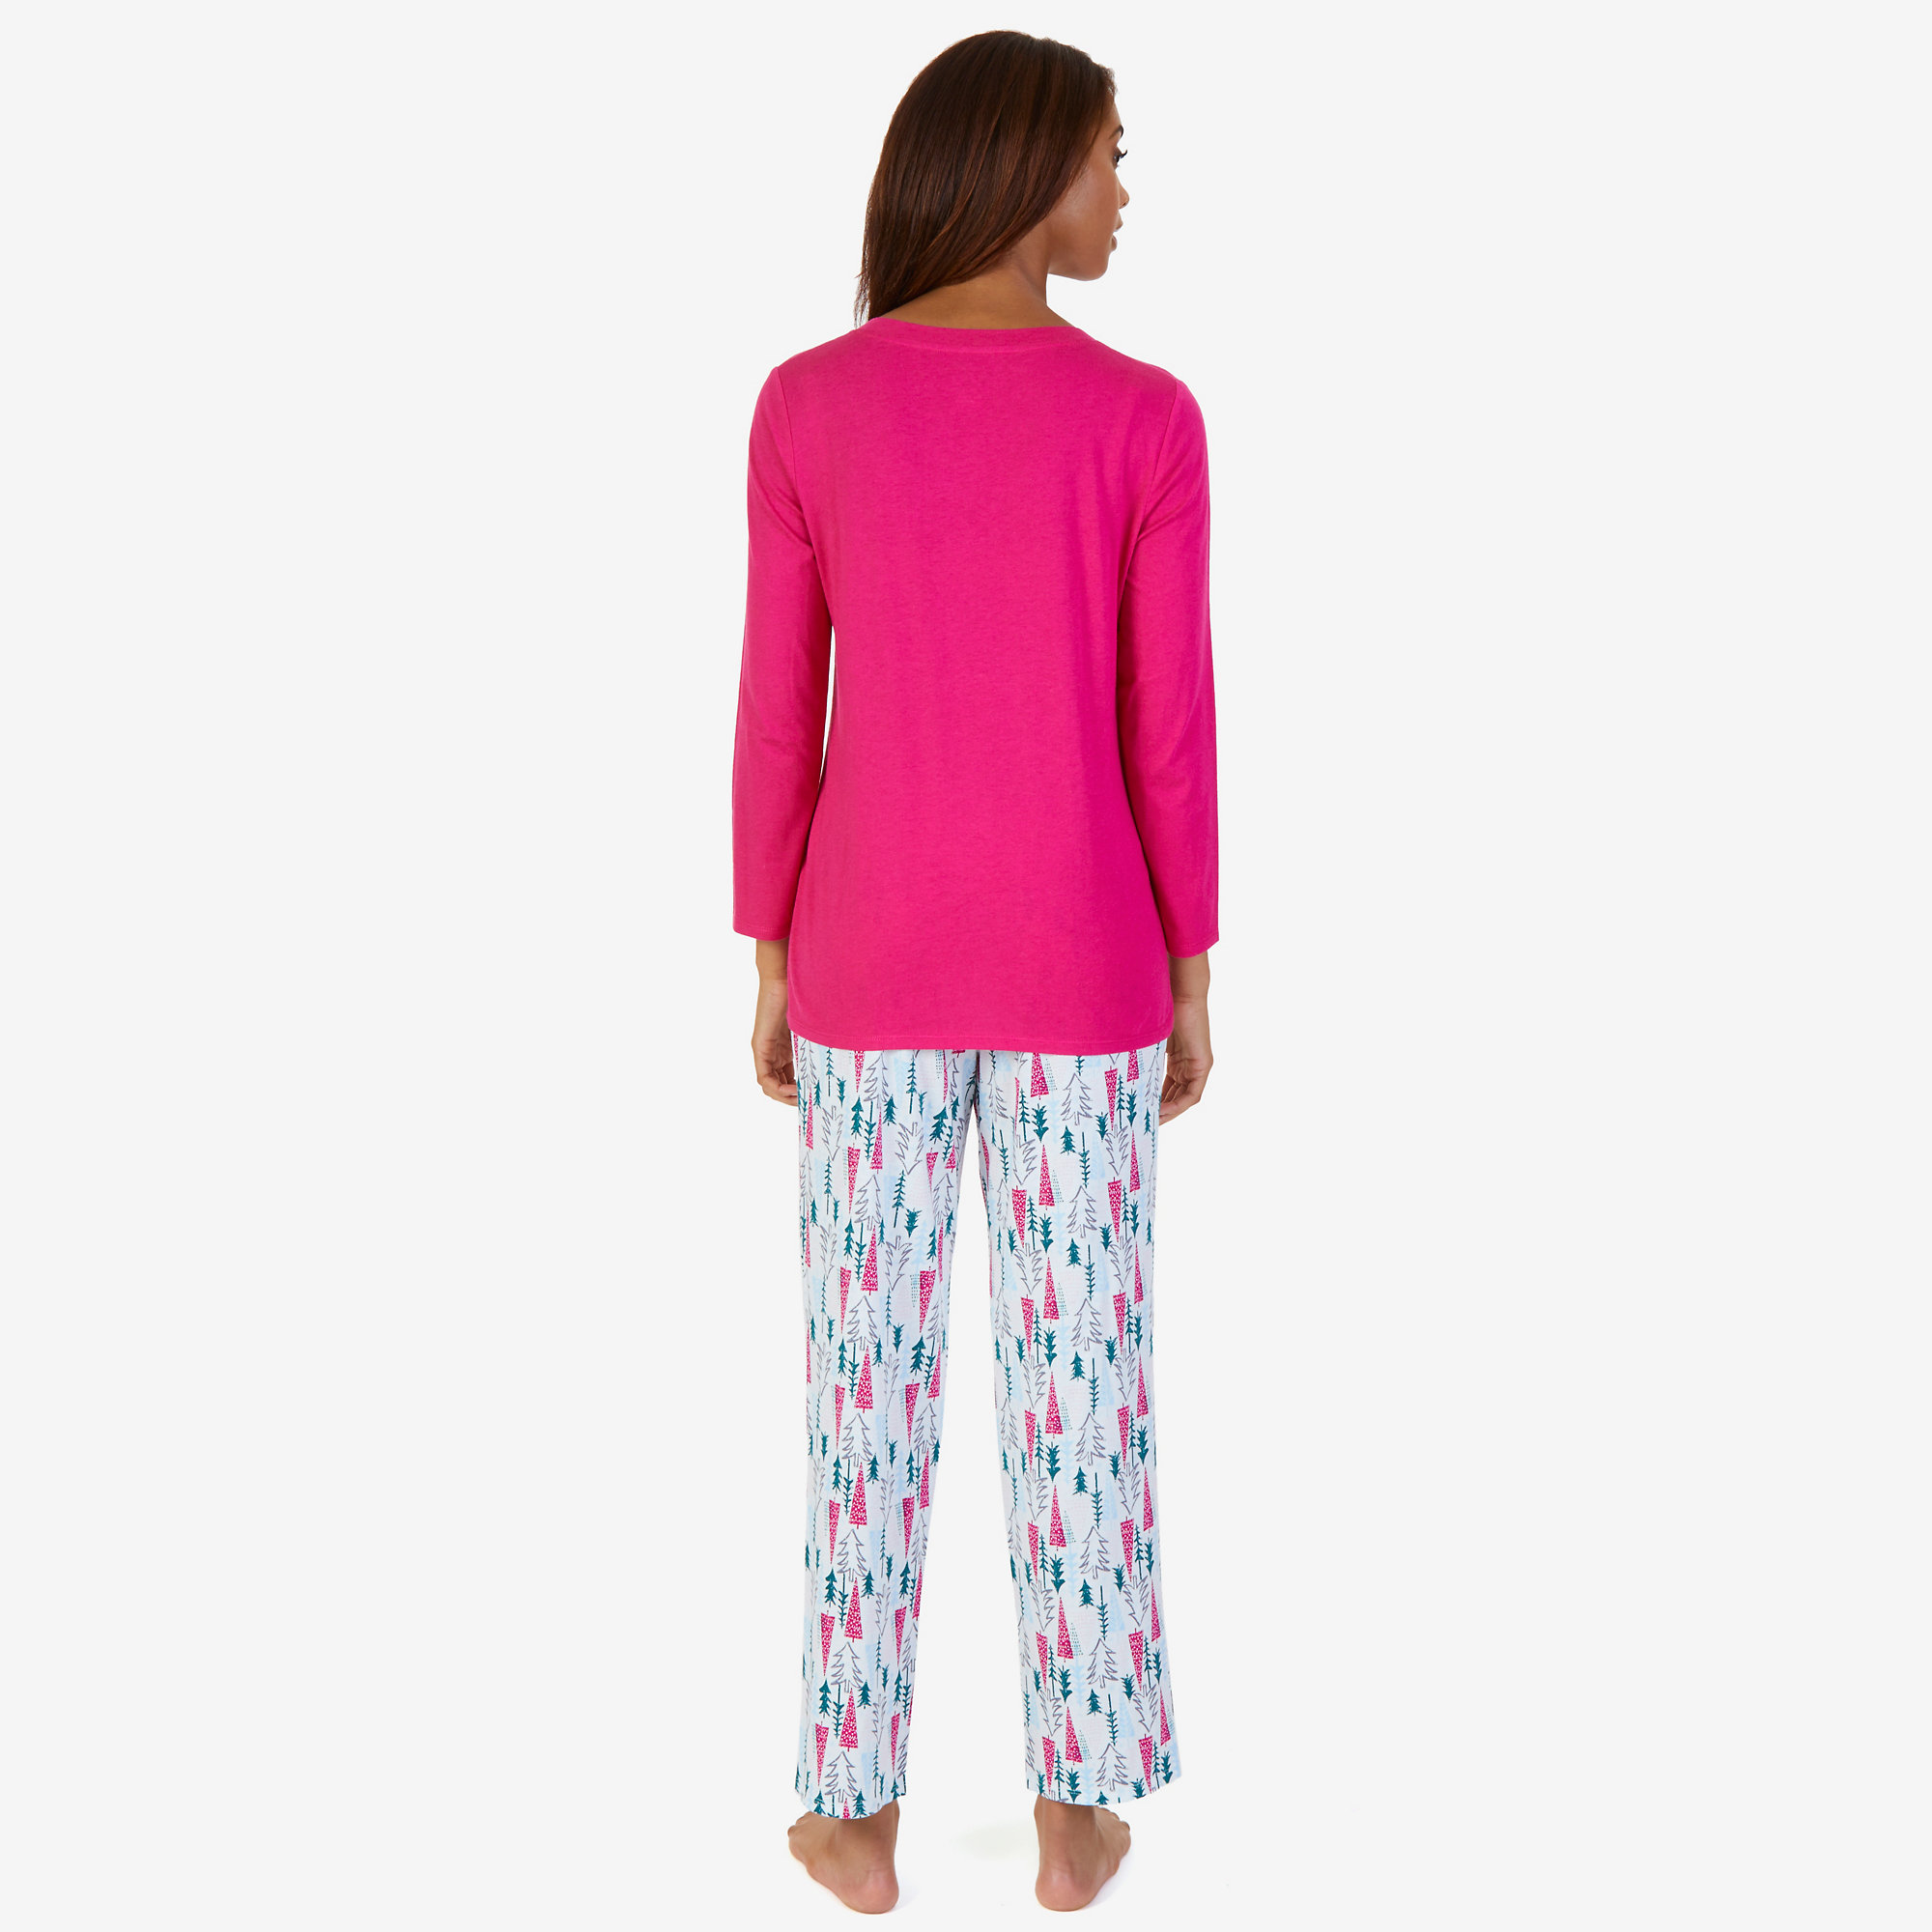 prdovr tank m madewell pdp comforter category pajamas sleepwear most lounger comfortable enlarge jsp pajama